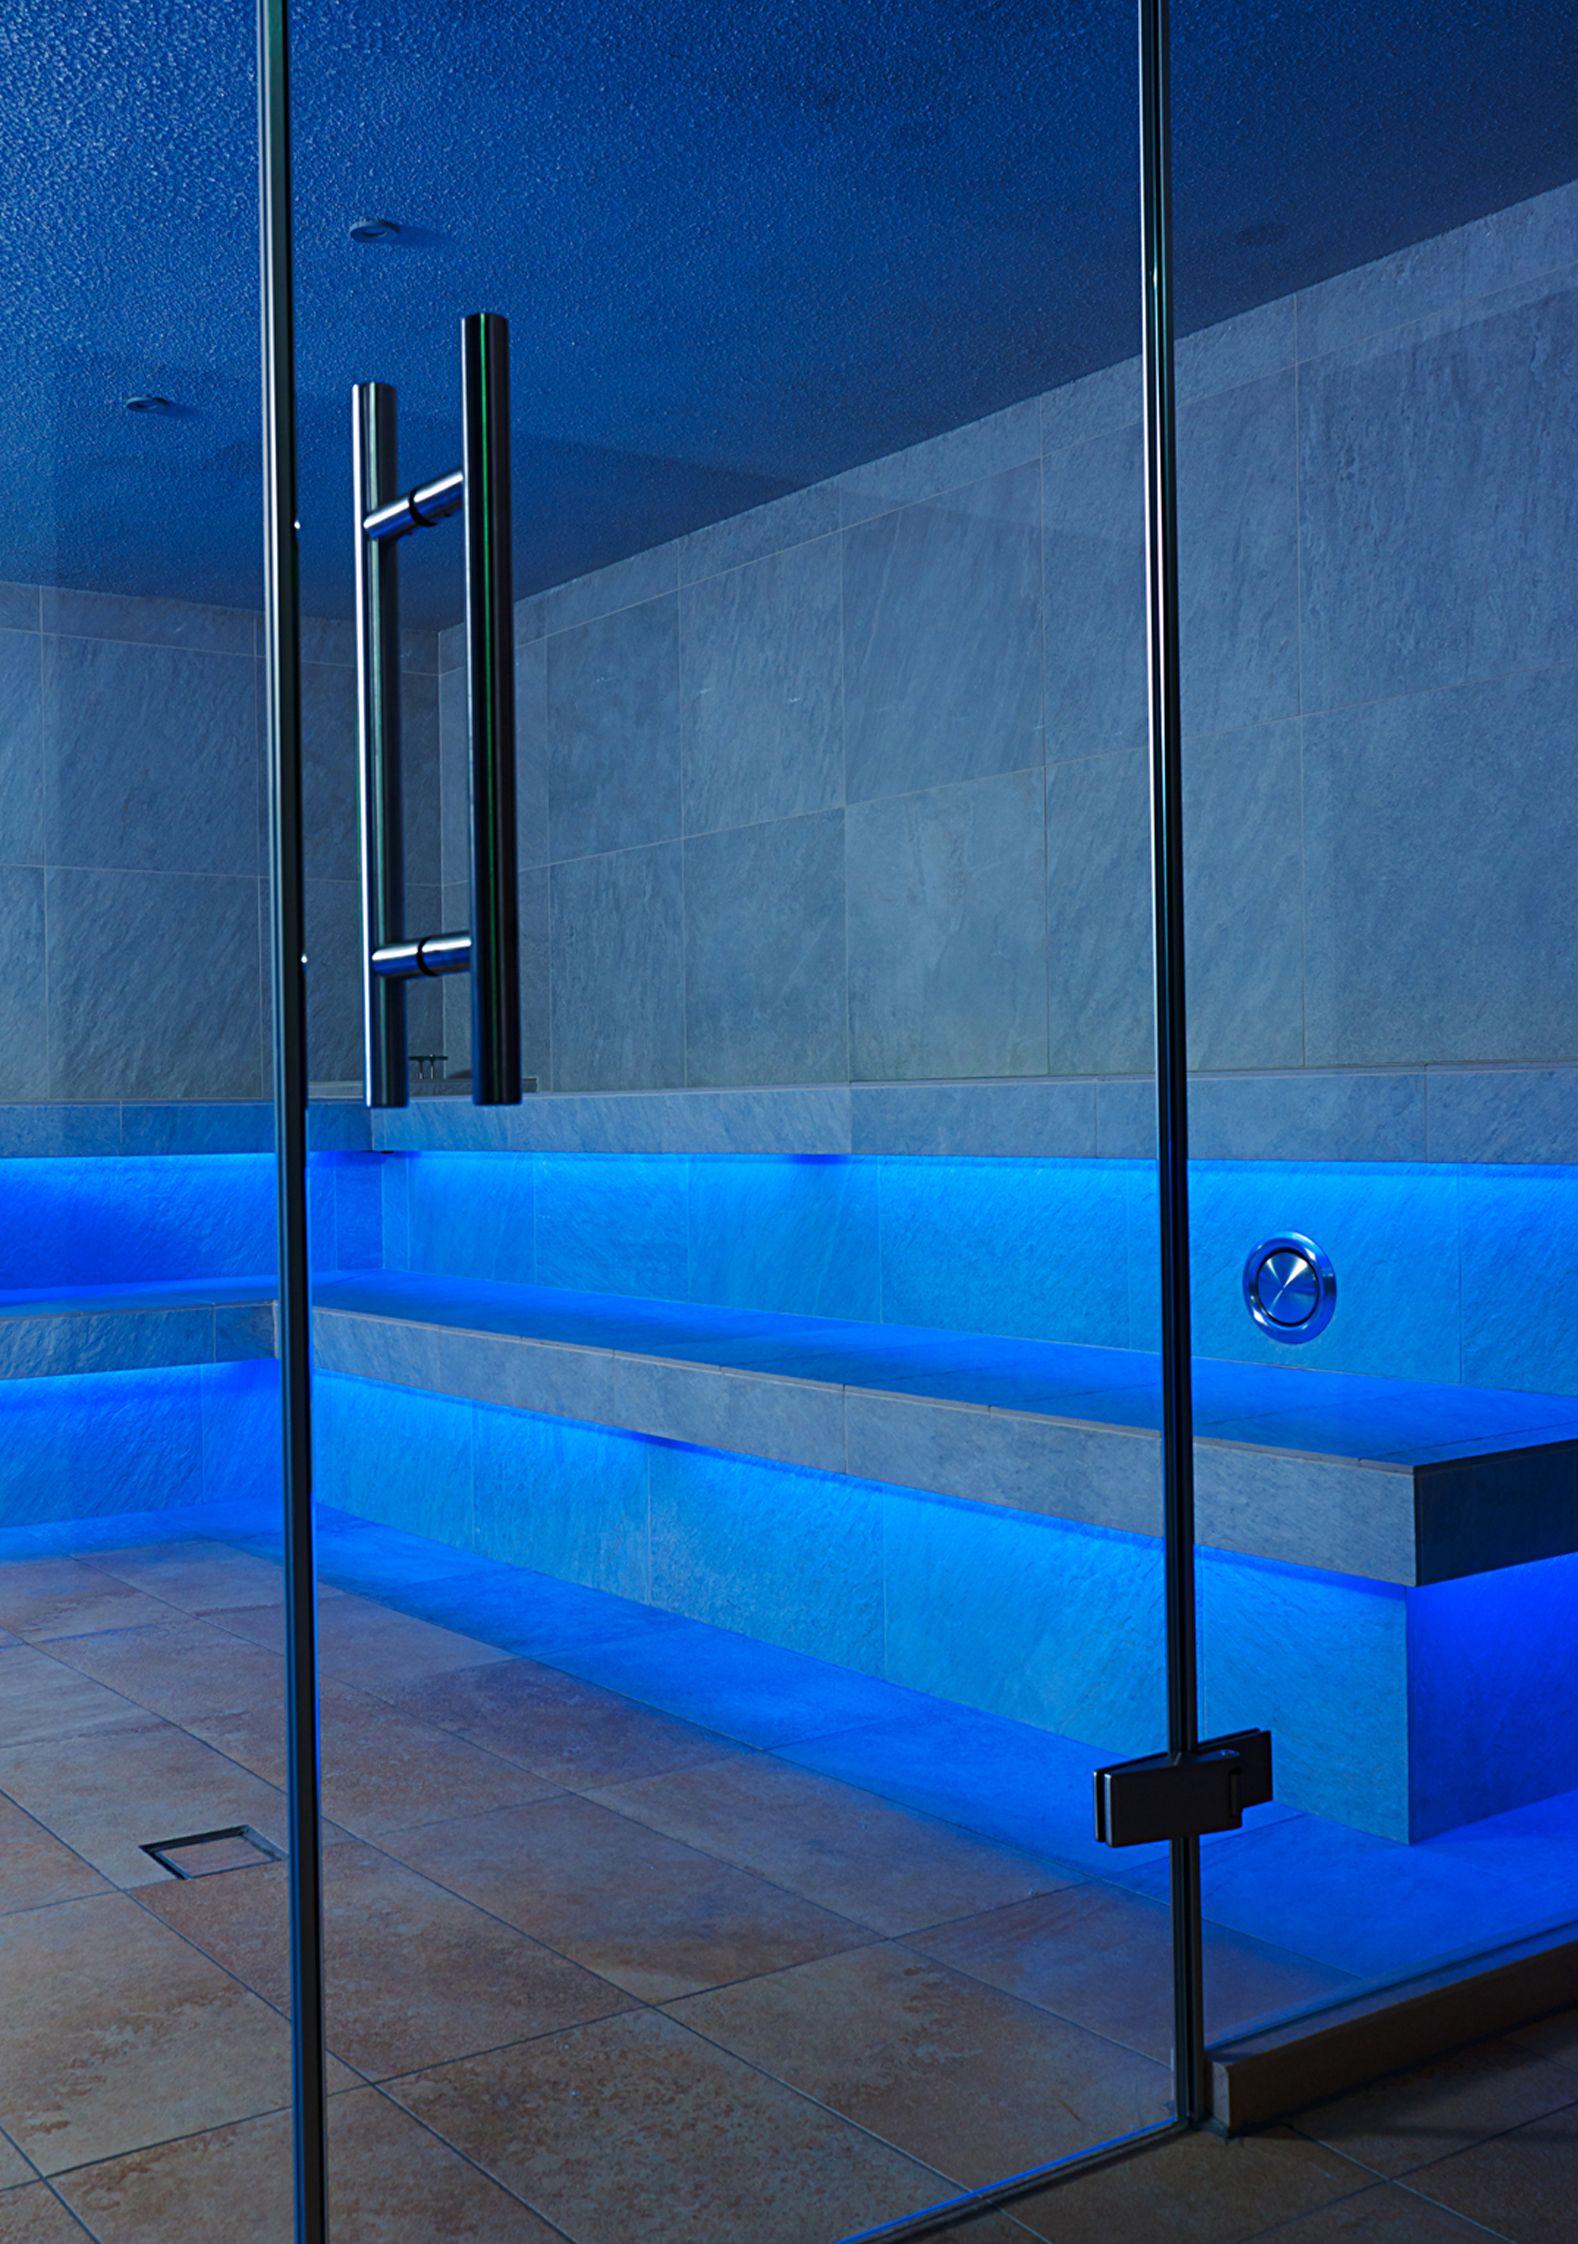 Shower Enclosure 9001s Hydro Massage Jets Led Lights Luxury Bathtub Steam Room Bathmaster Steam Shower Enclosure Shower Cabin Whirlpool Tub